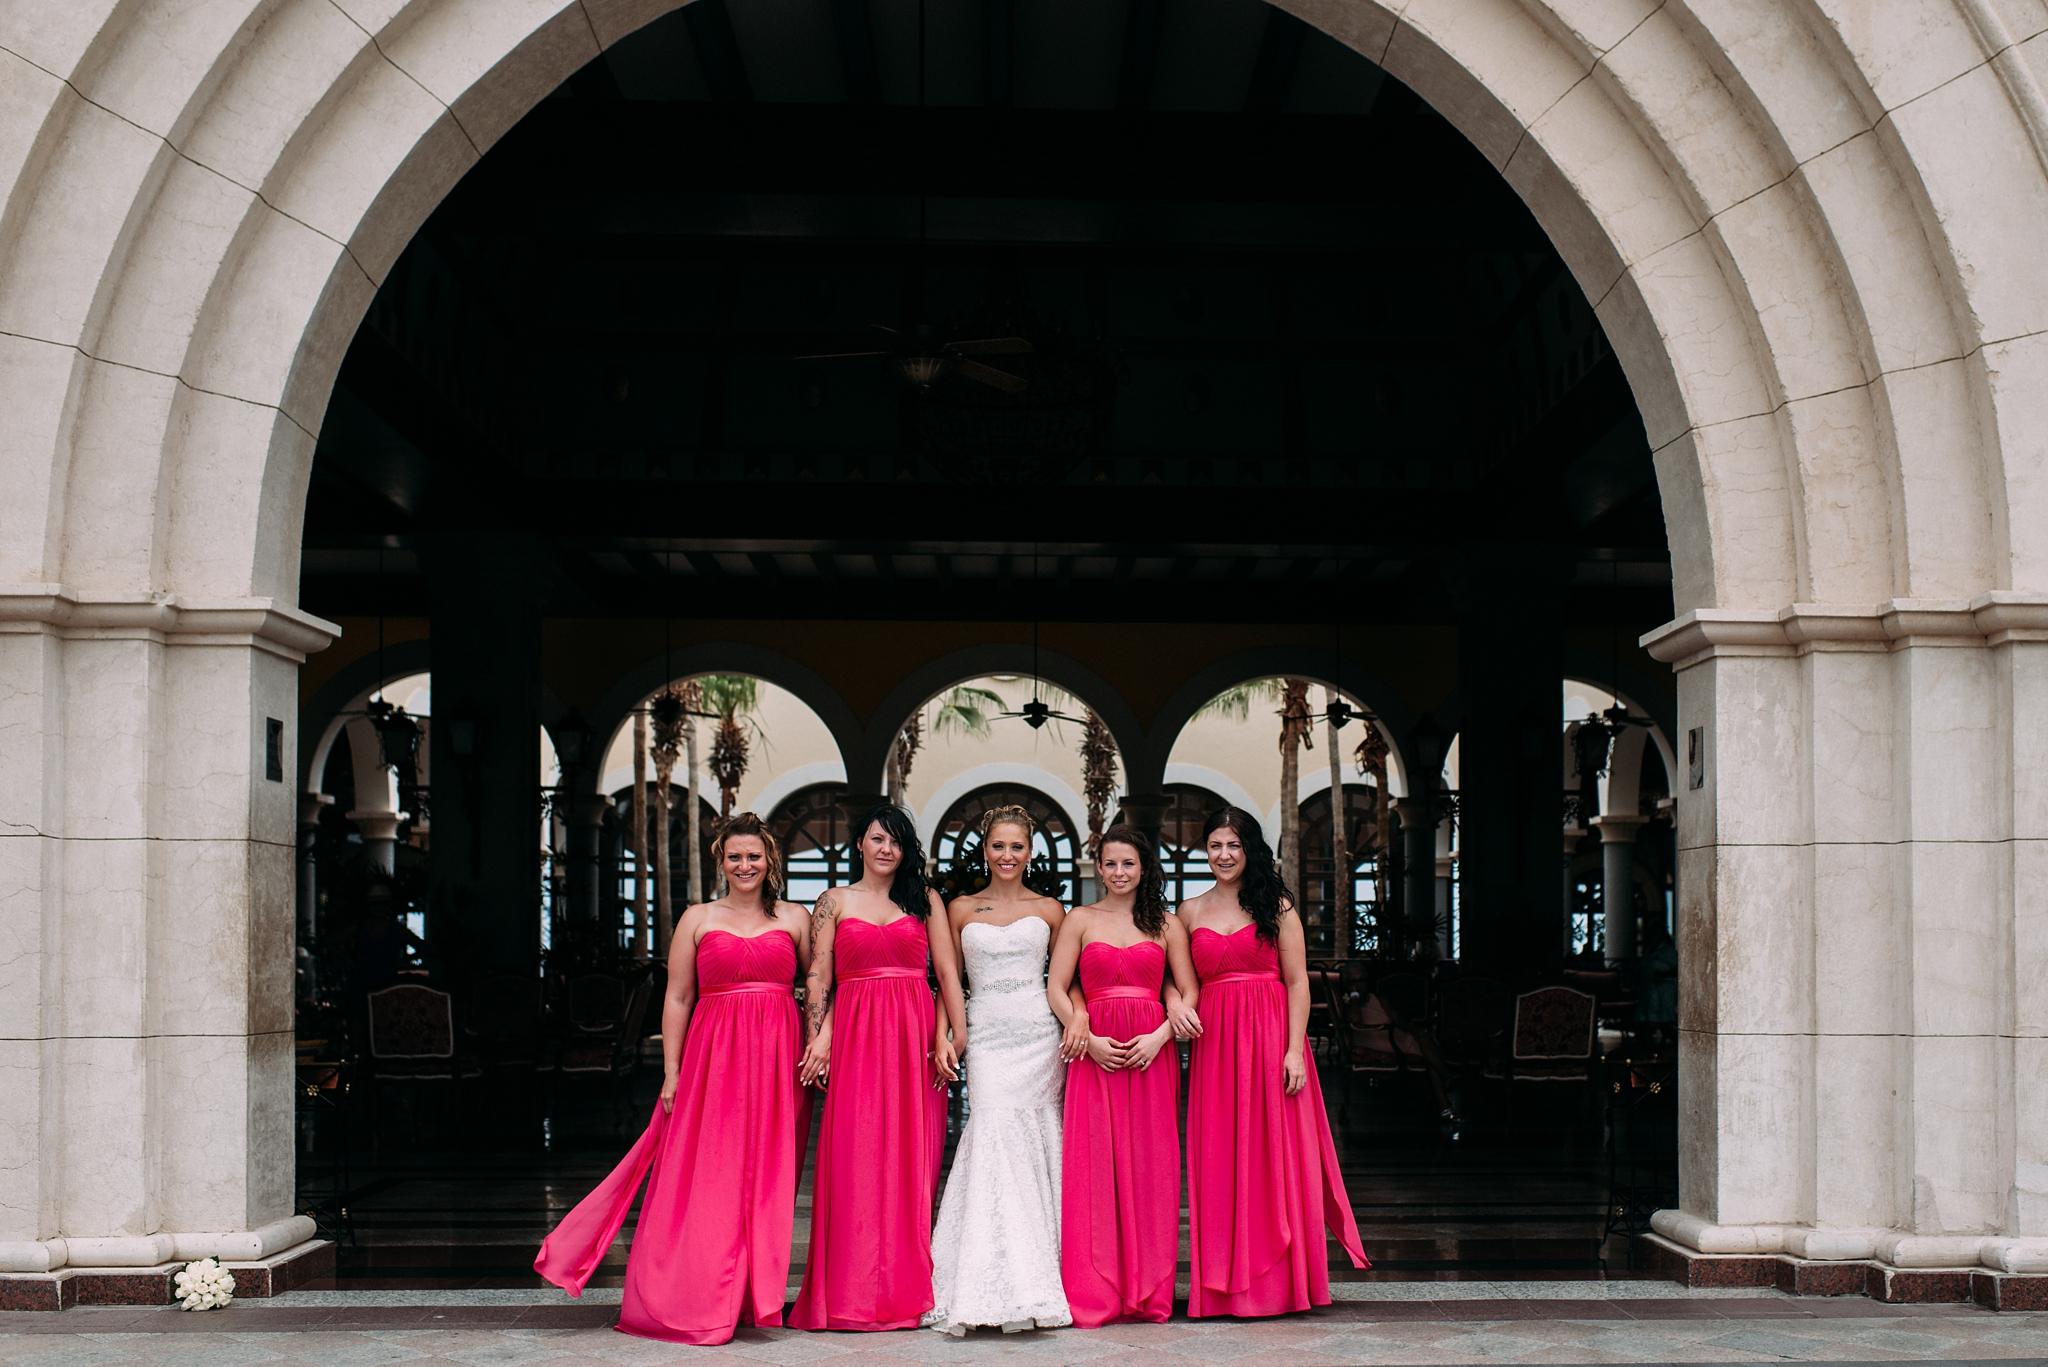 kaihla_tonai_intimate_wedding_elopement_photographer_1358